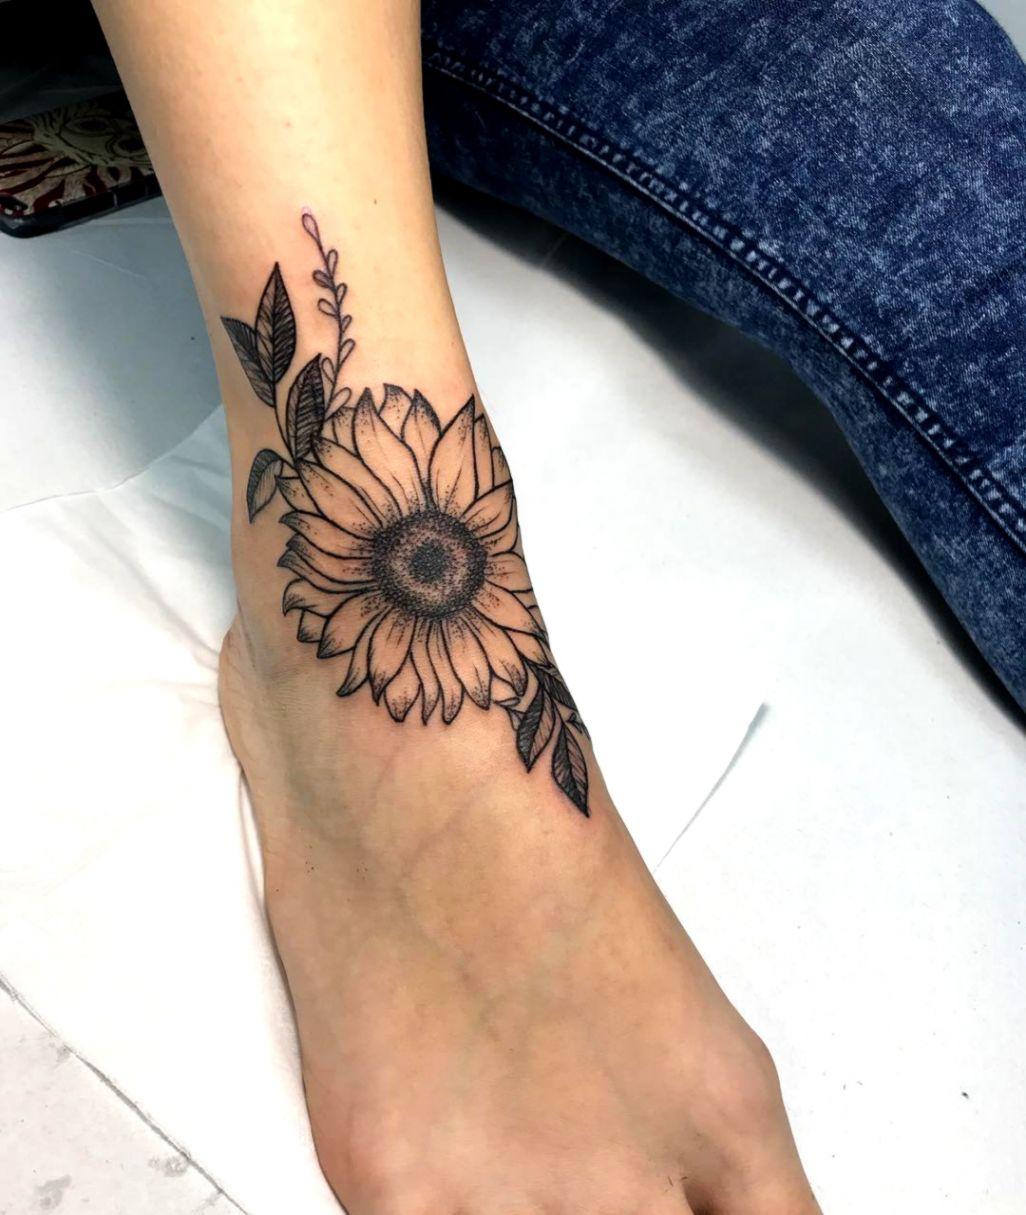 e1ac76df1 Dashing Sunflower Tattoo On Foot Blurmark